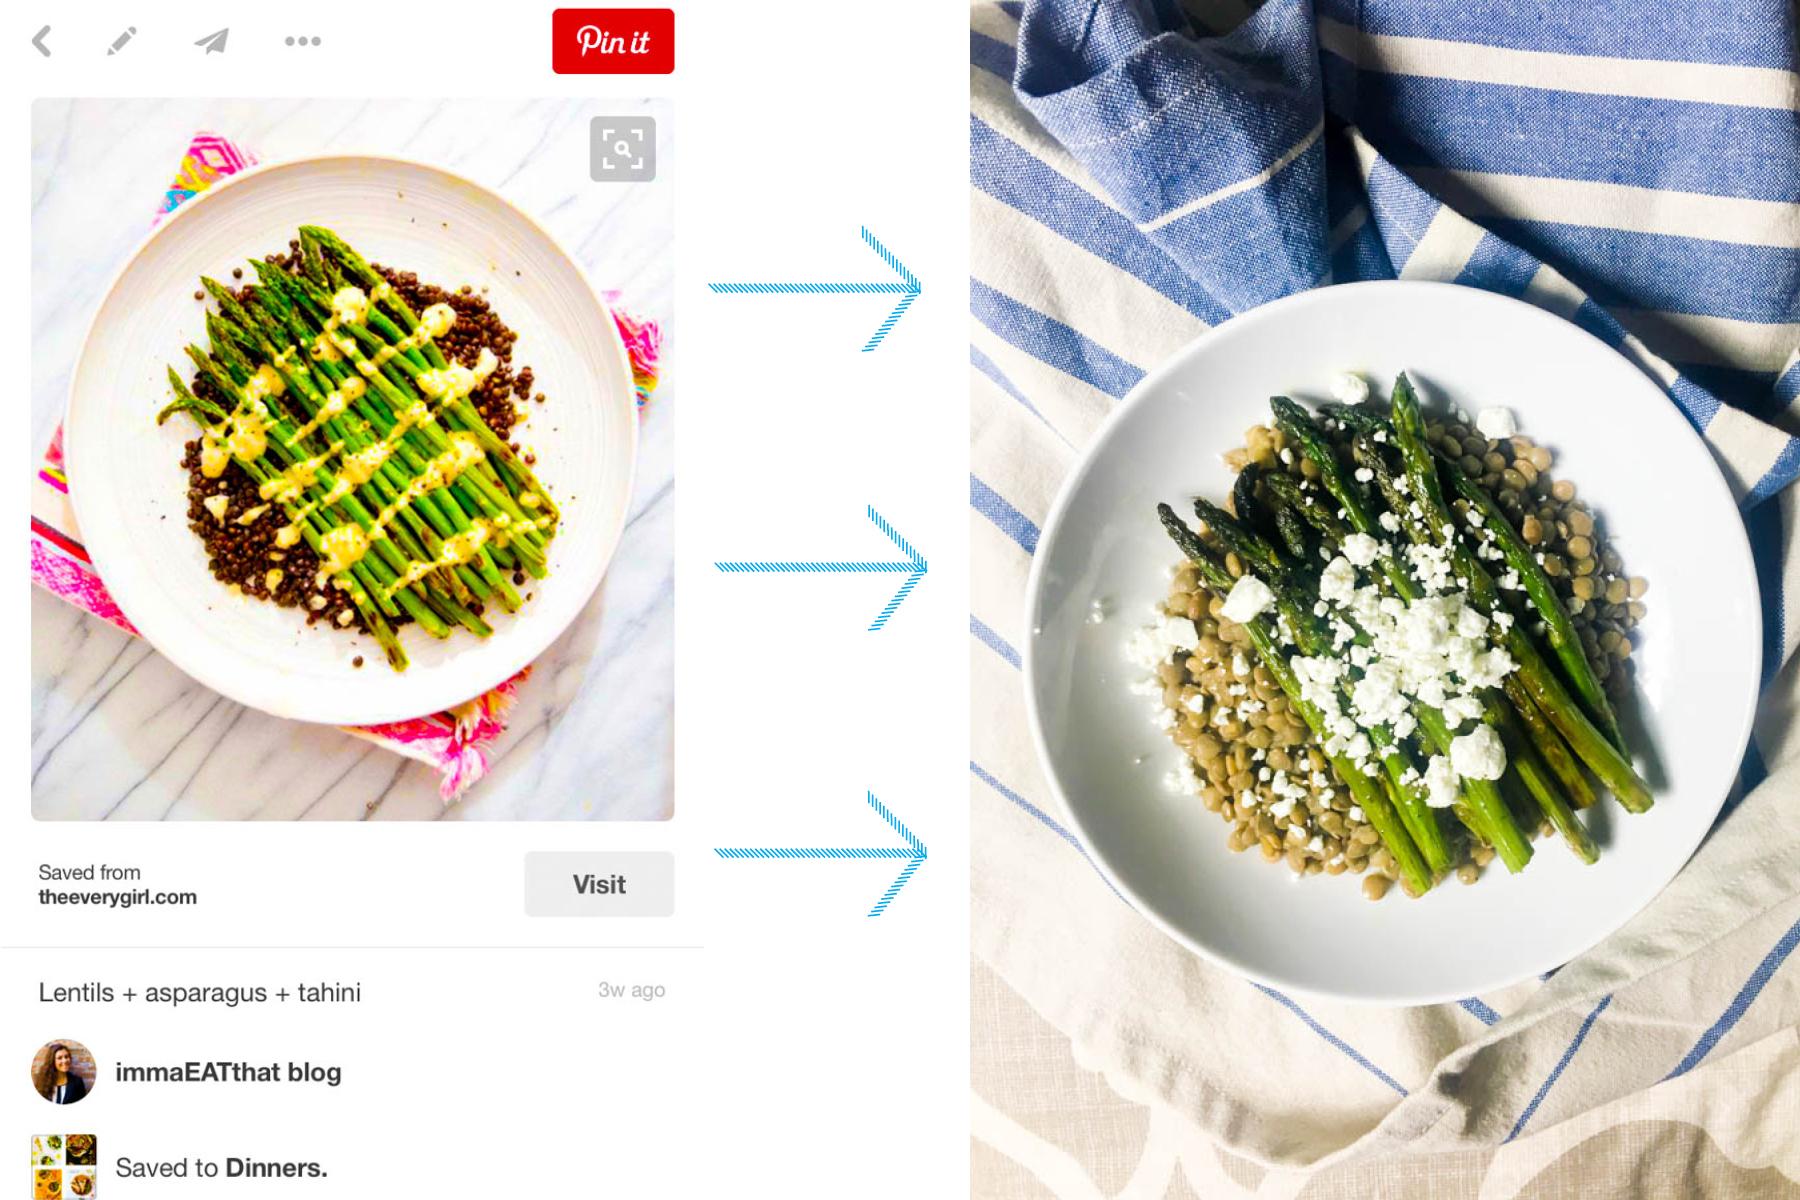 lentils + asparagus + goat cheese. Dinner idea! | immaEATthat.com